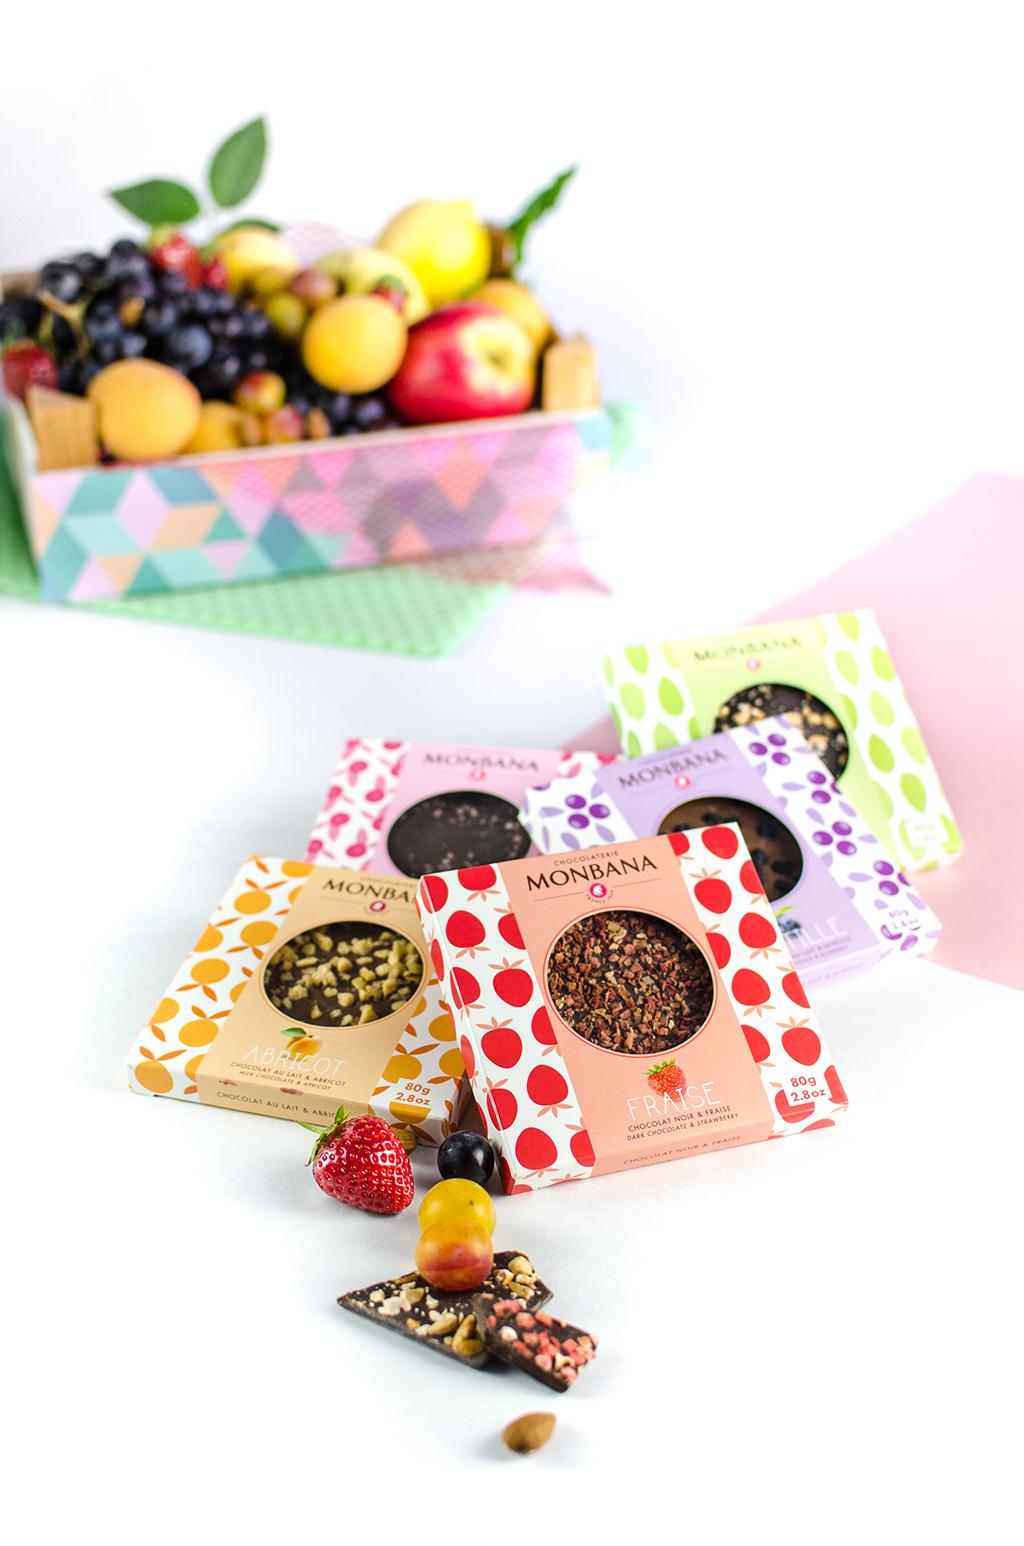 Packagings tablettes fruitées – Monbana